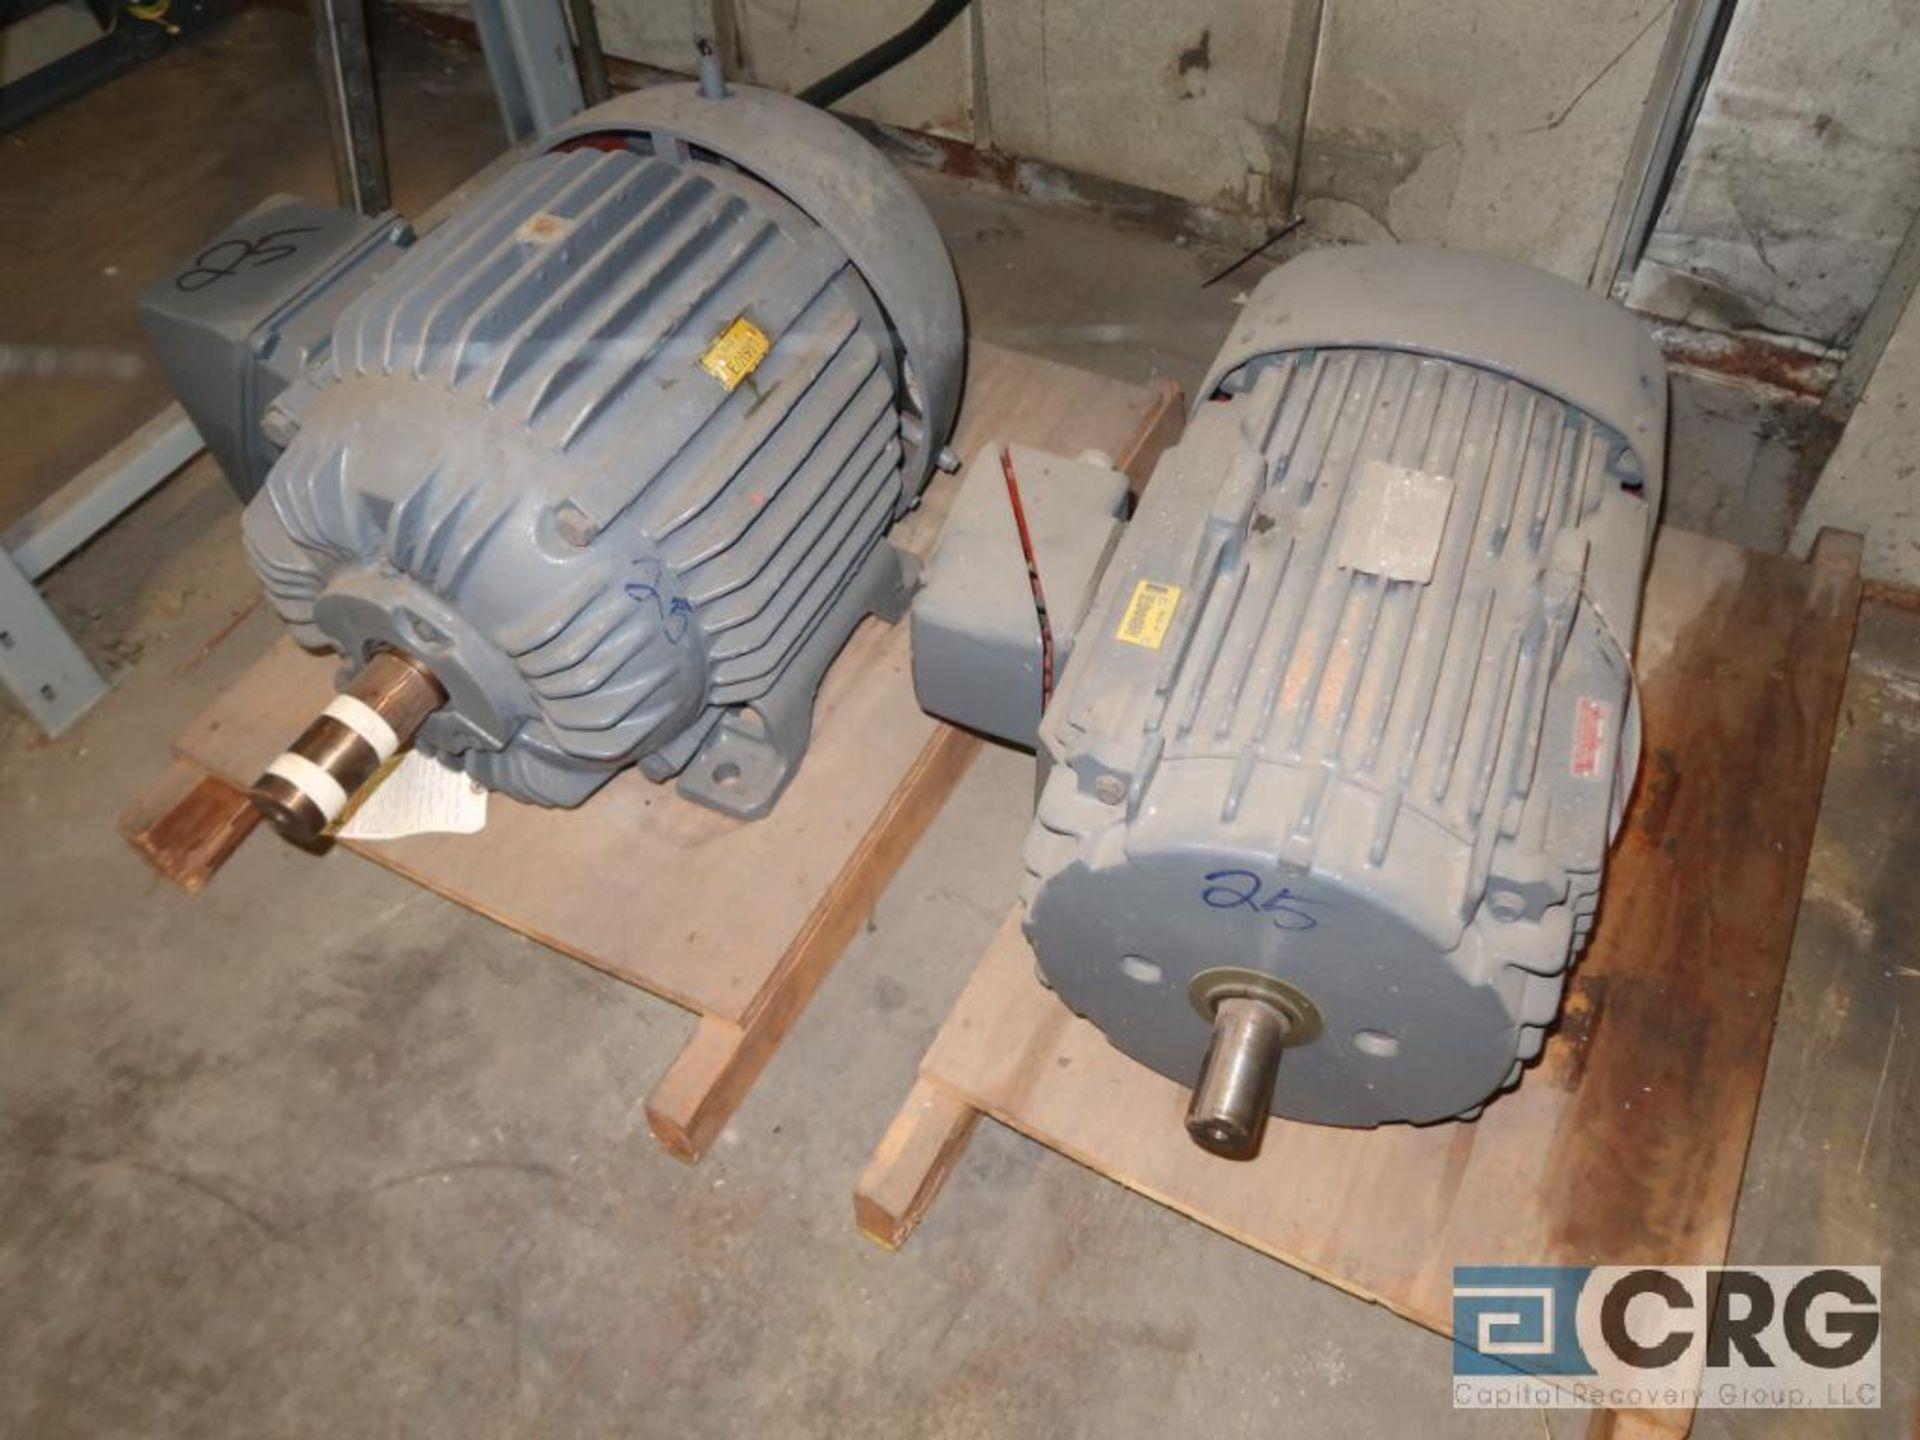 Lot of (4) assorted 25 HP motors (Motor Building) - Image 2 of 2